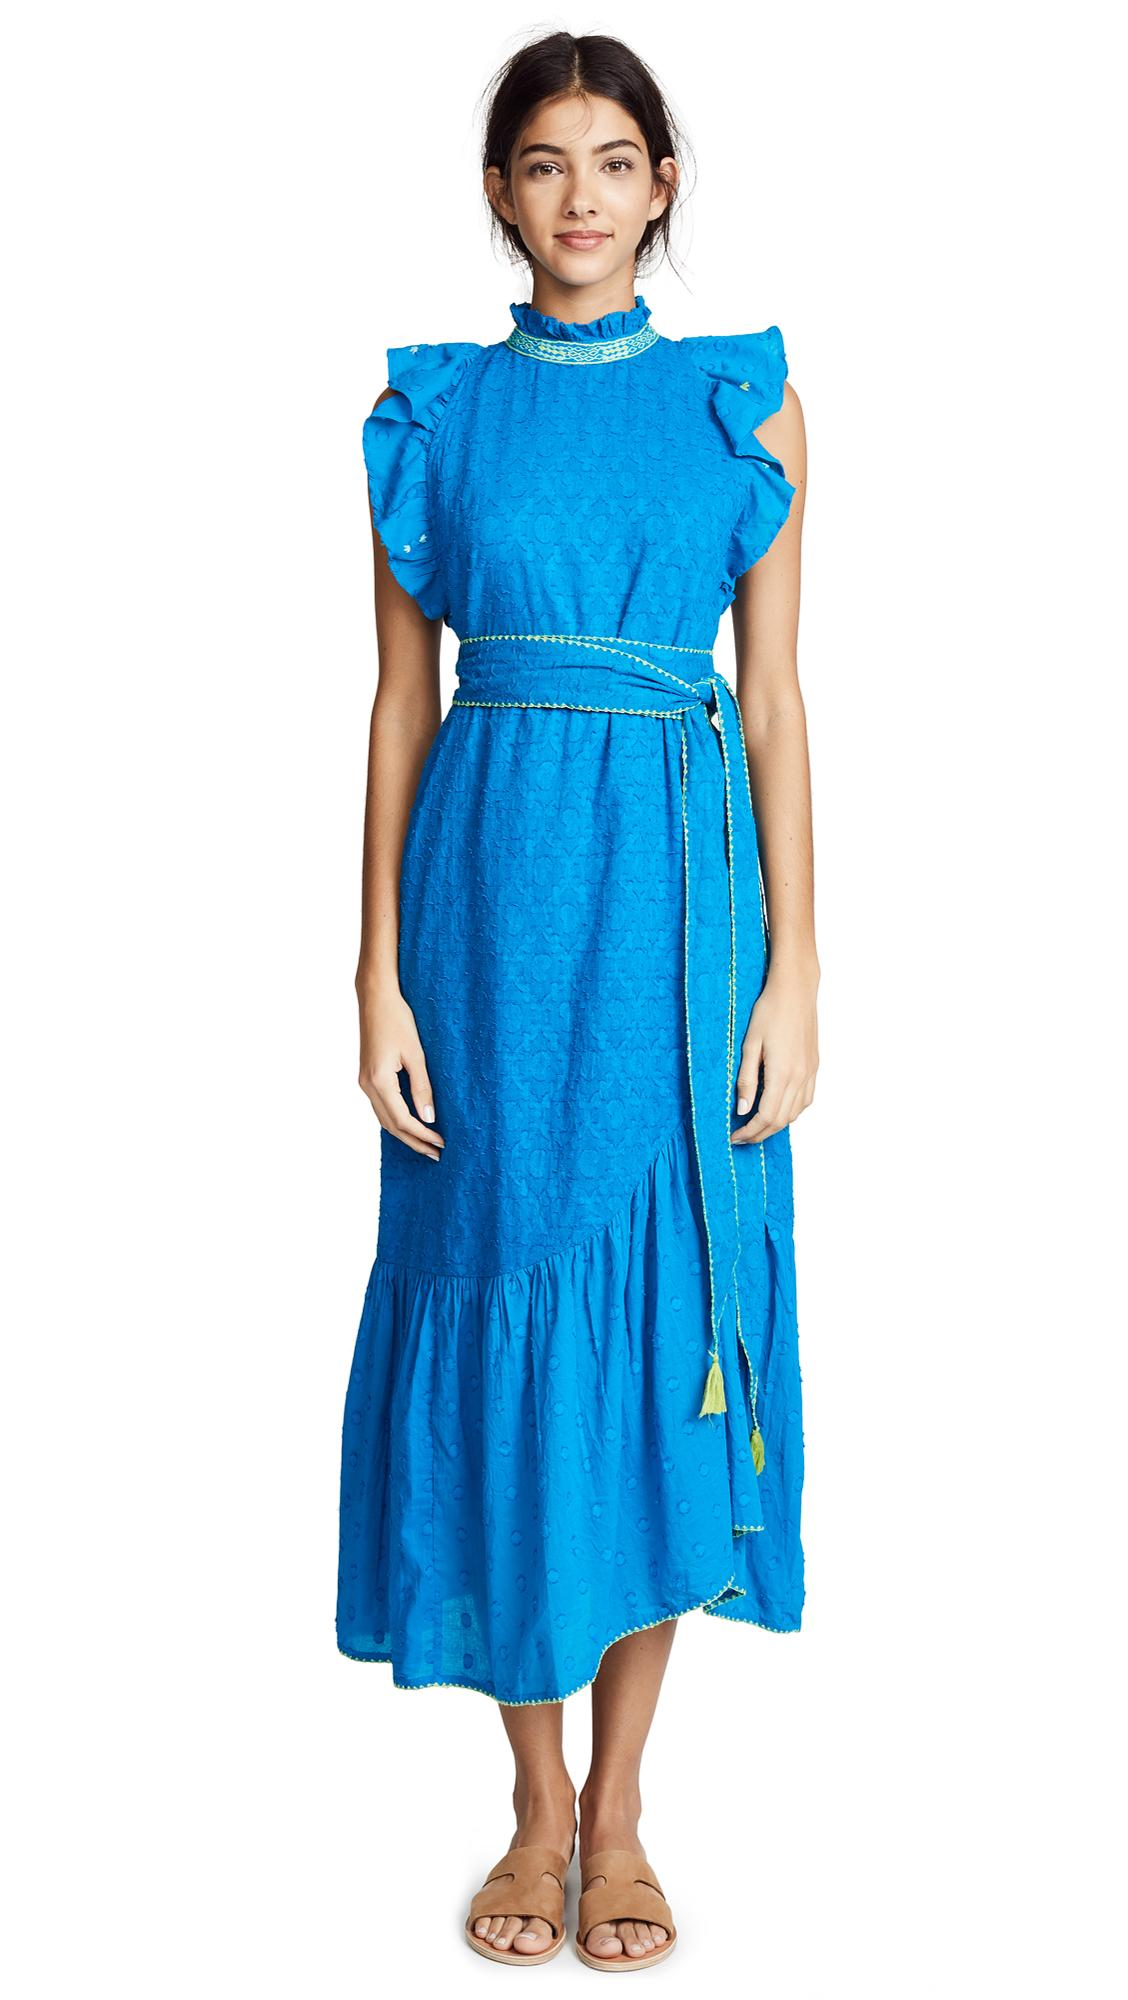 Banjanan Bulbul Dress In Turquoise Cotton Dobby